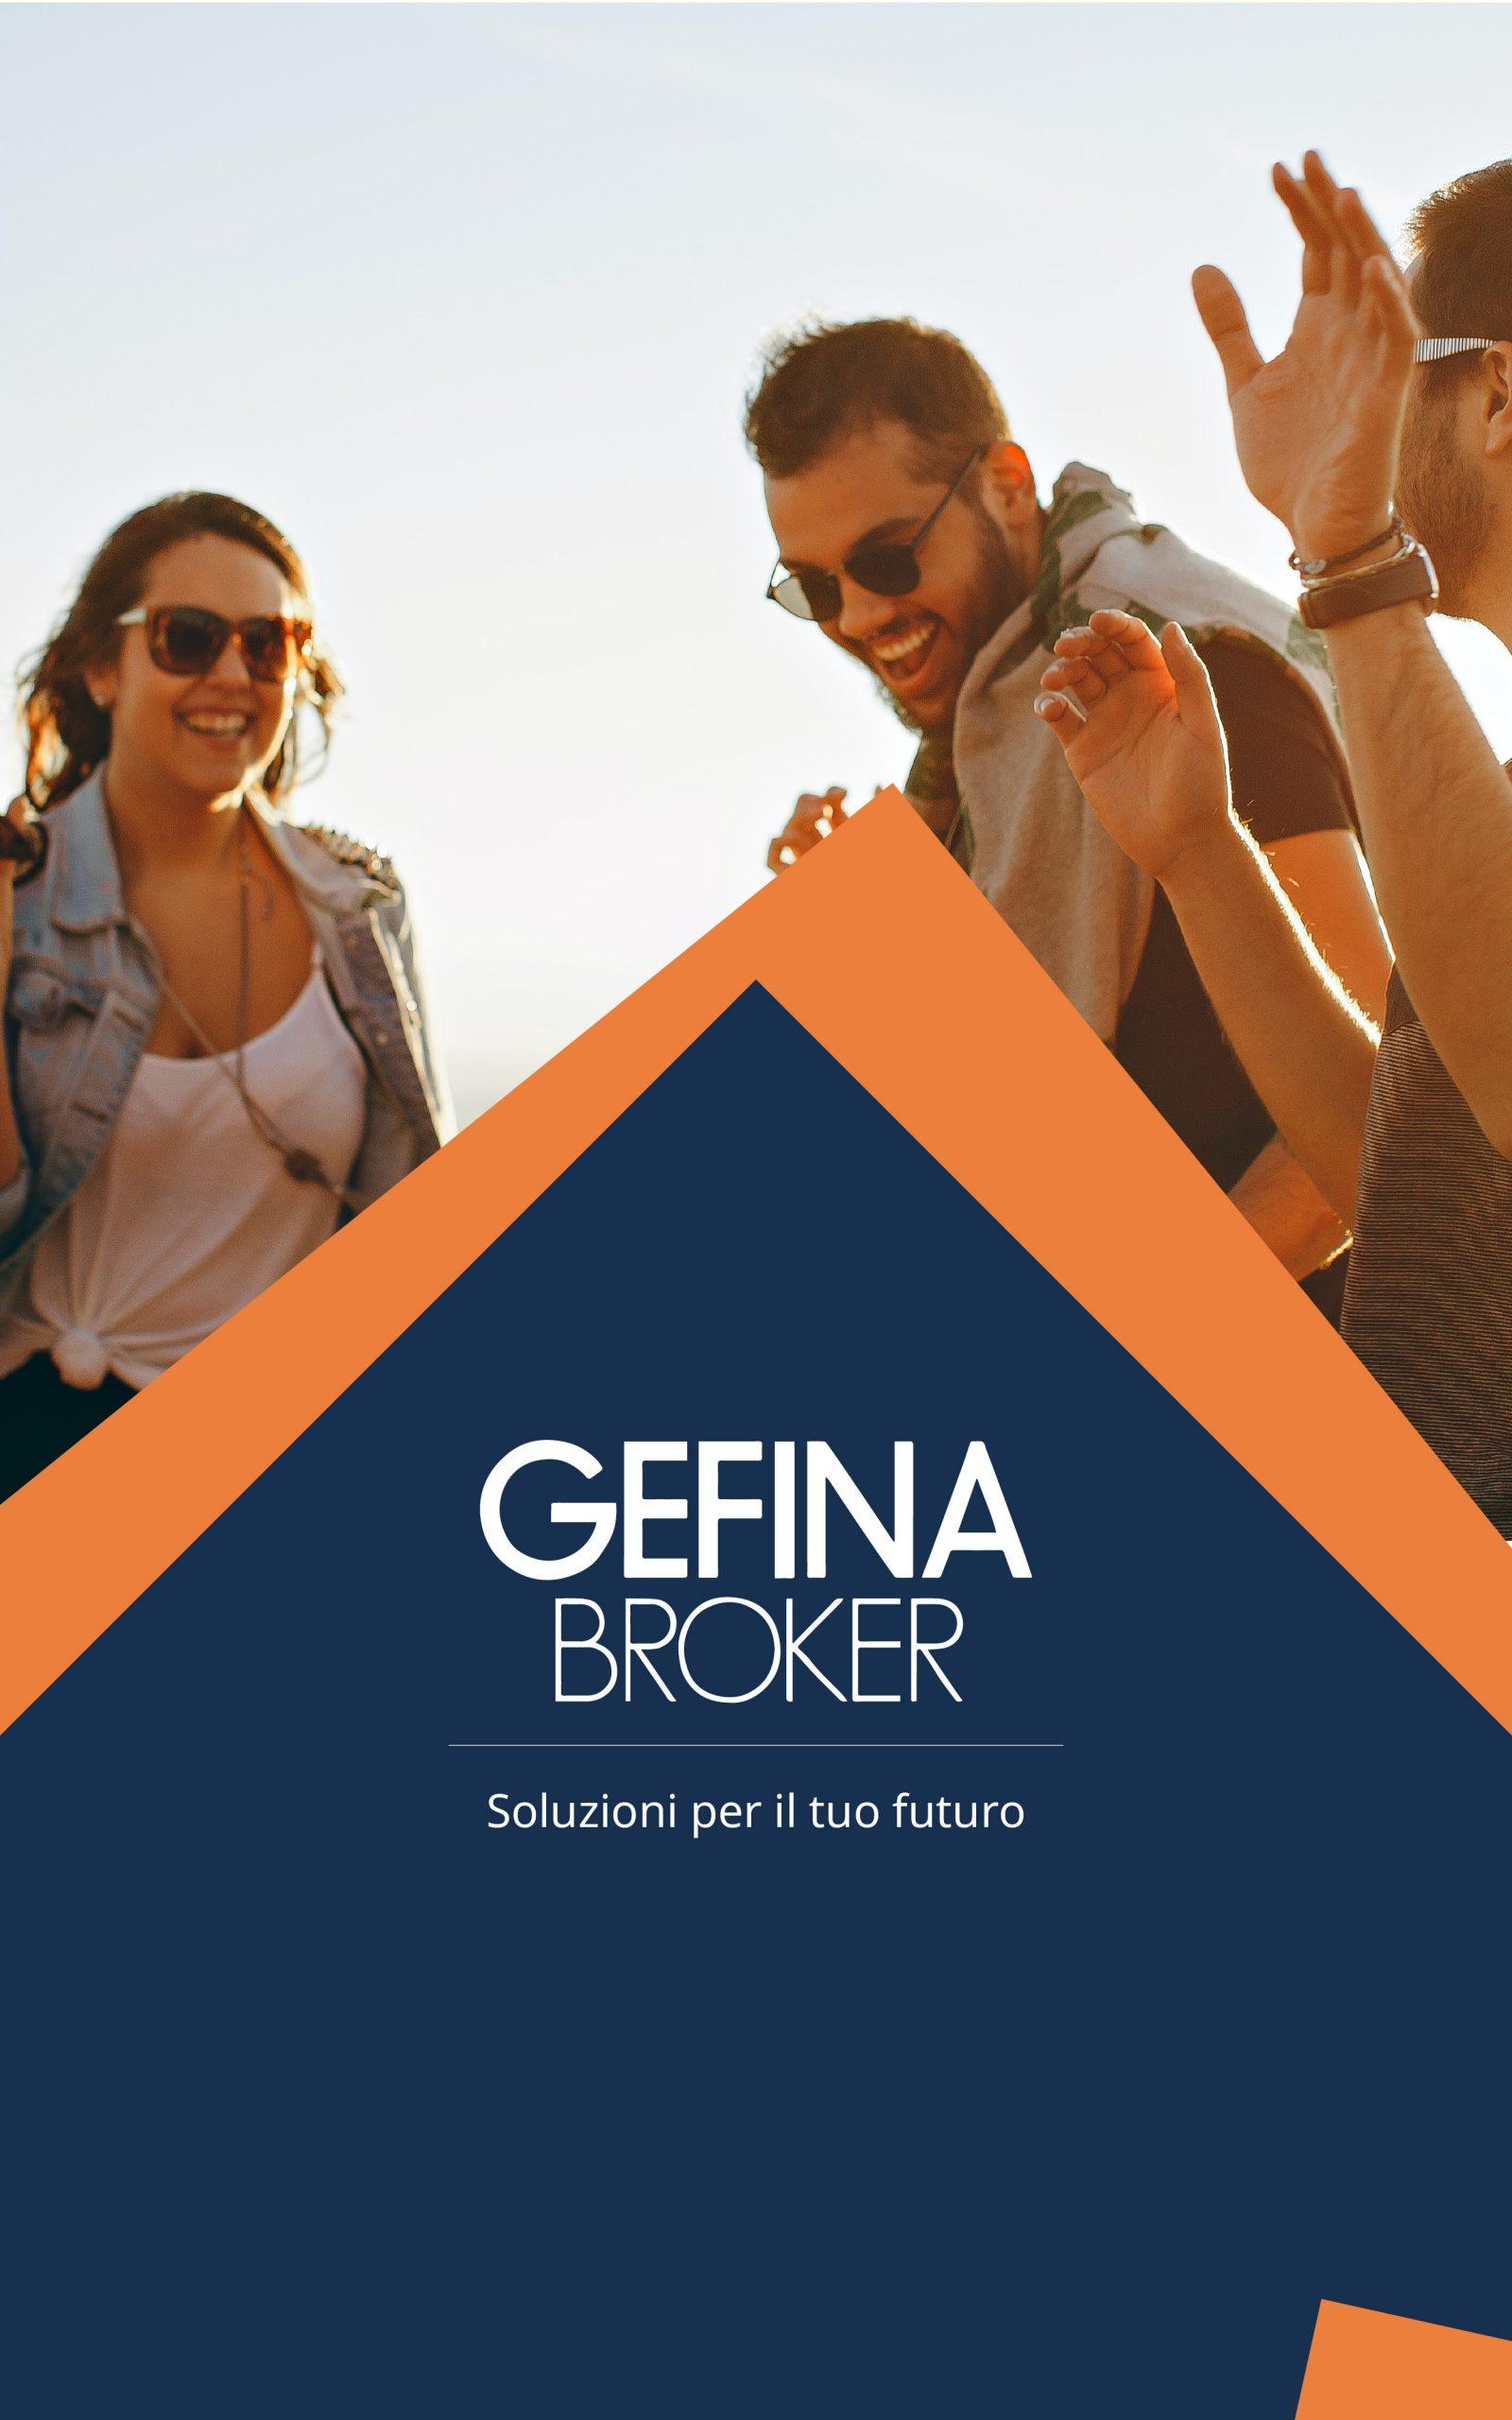 Gefina Broker Soluzioni futuro